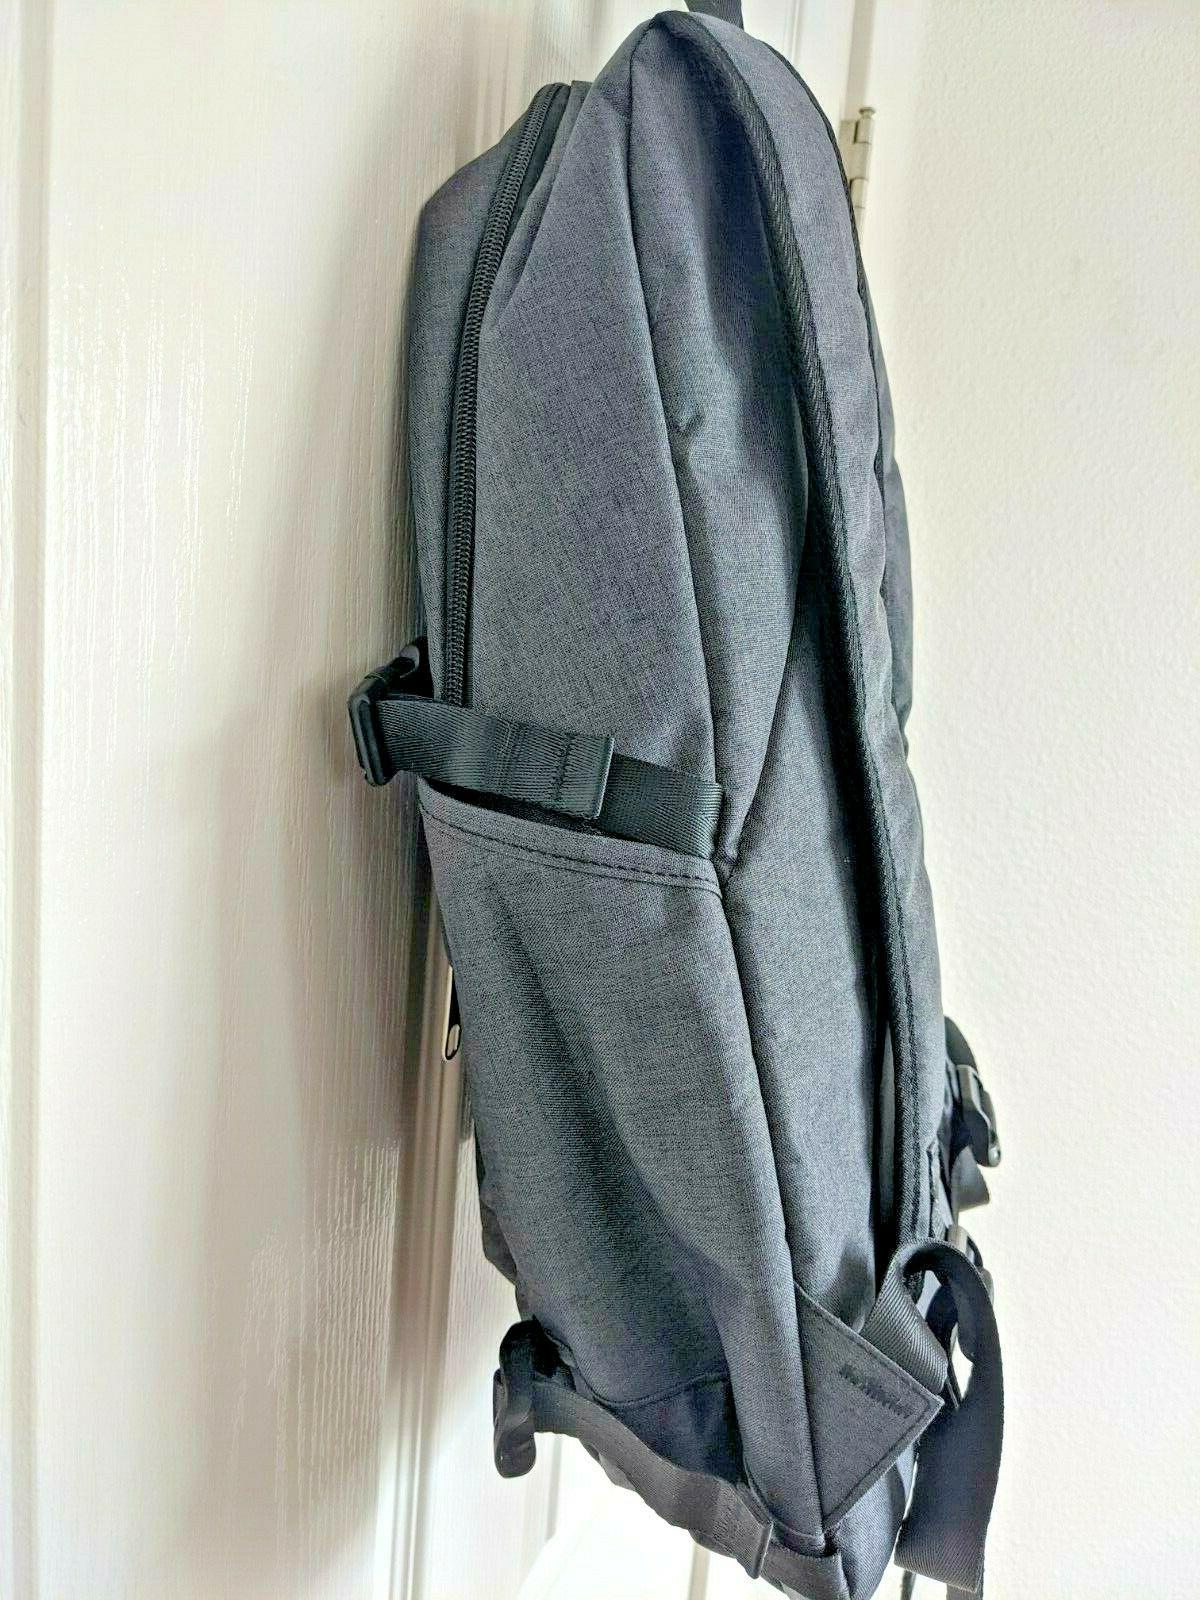 MANCRO Laptop Backpack Charging